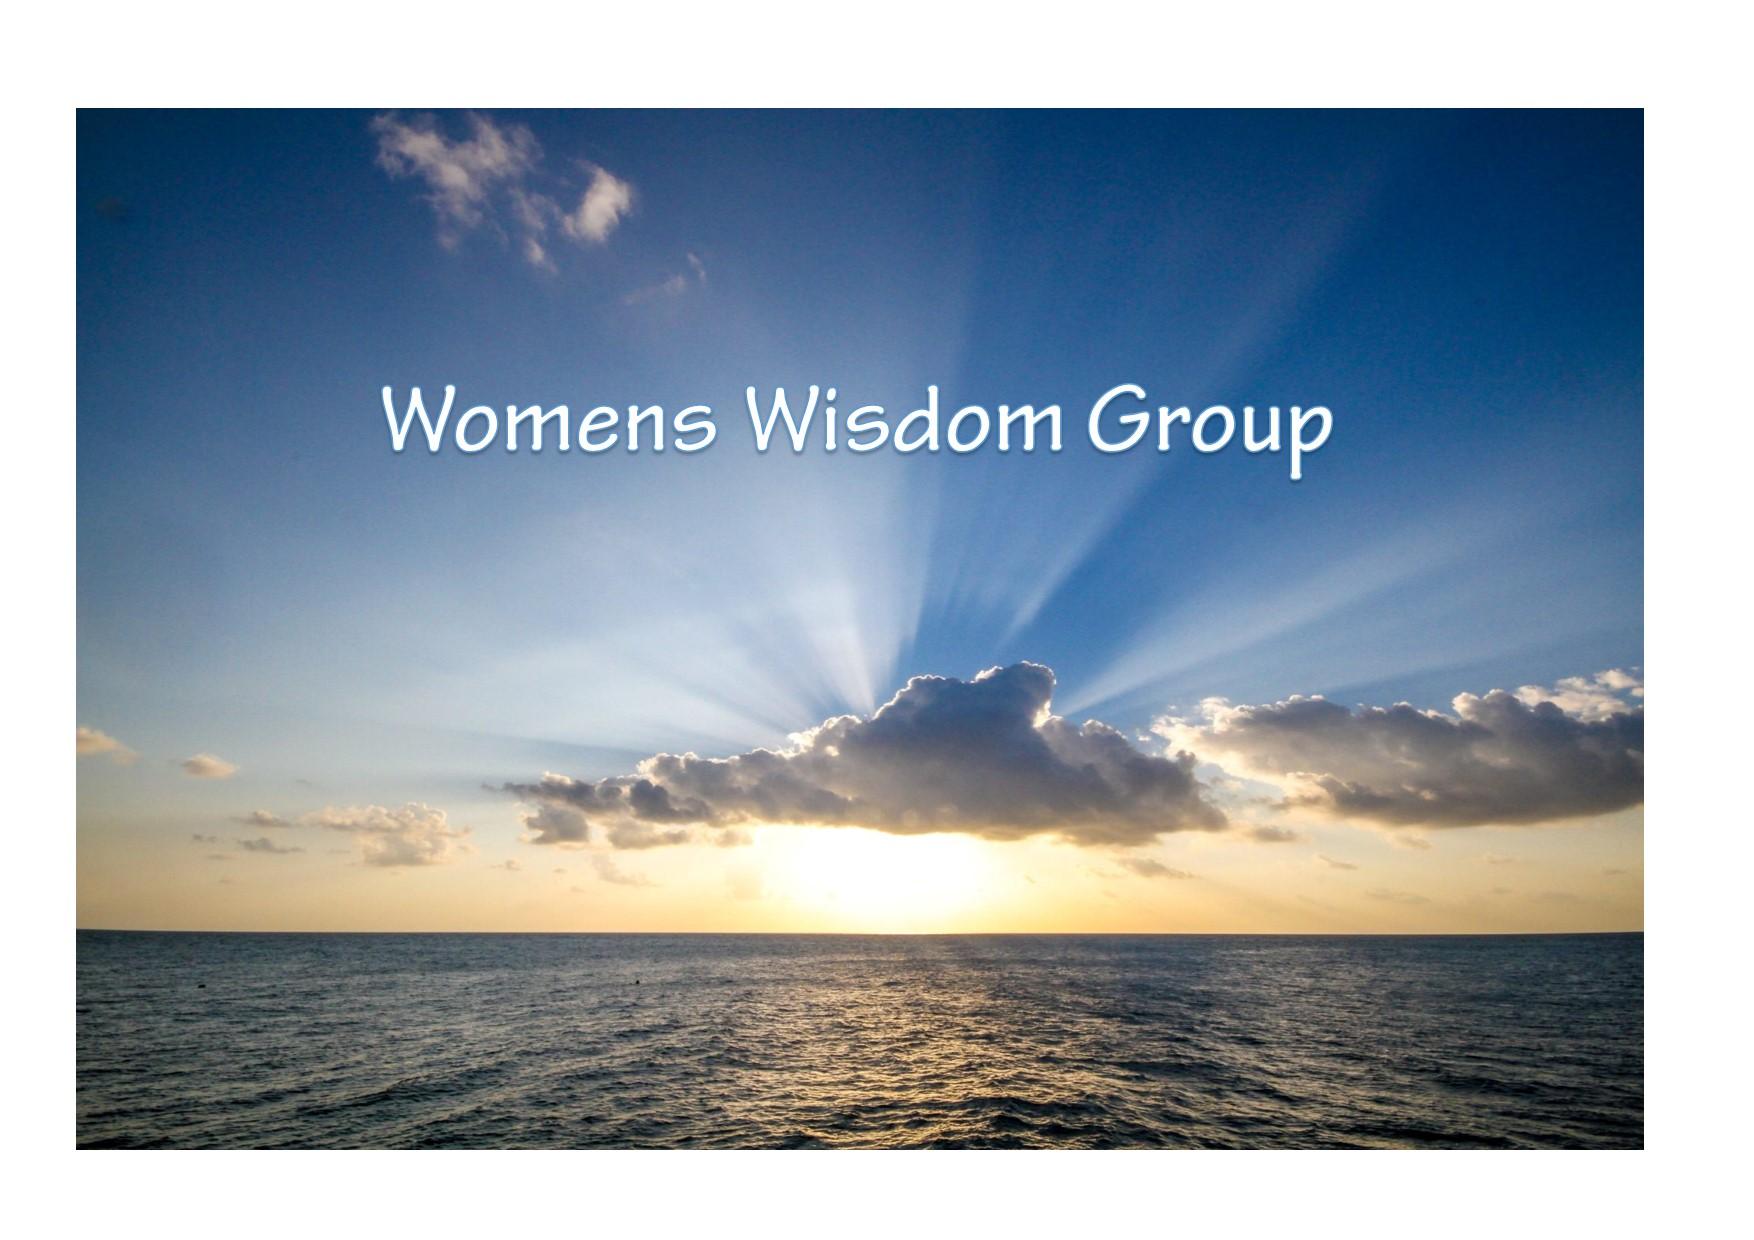 womens wisdom group